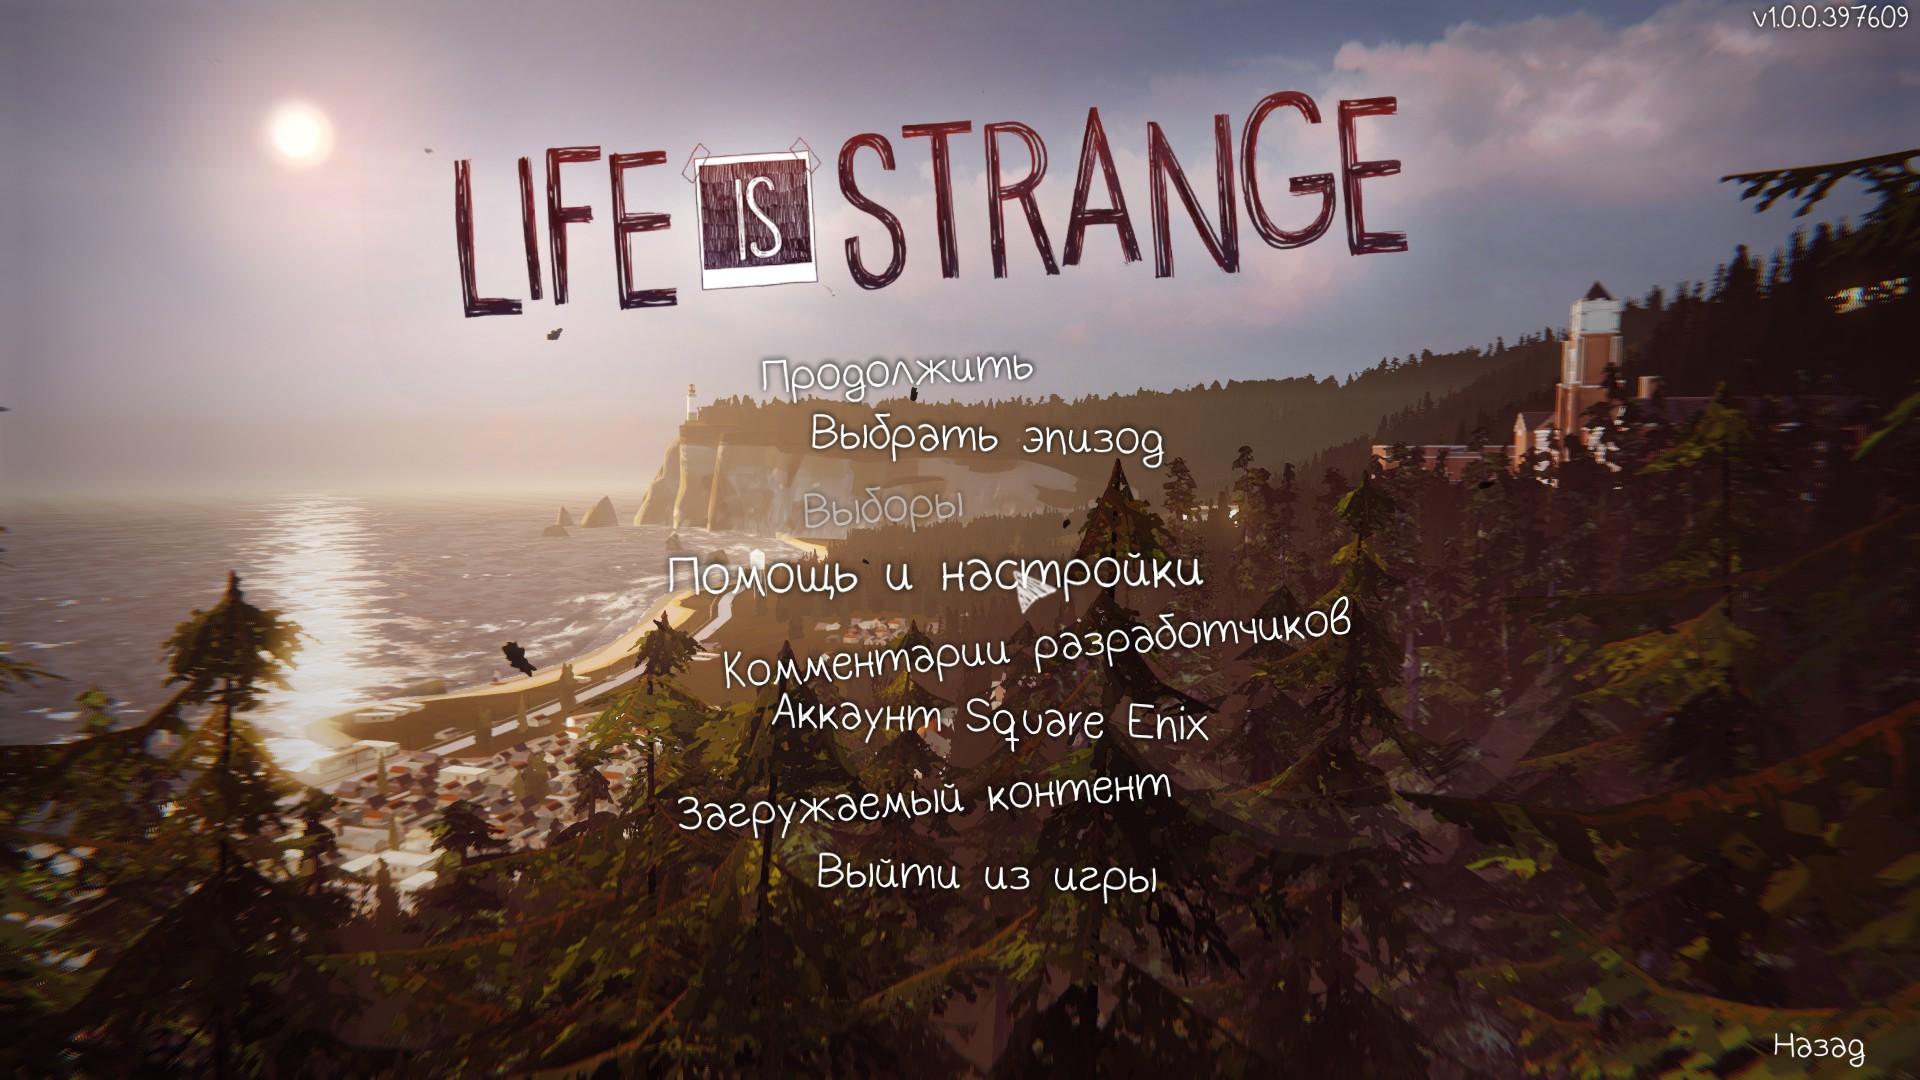 Life is strange. Episode 1-5 скачать.